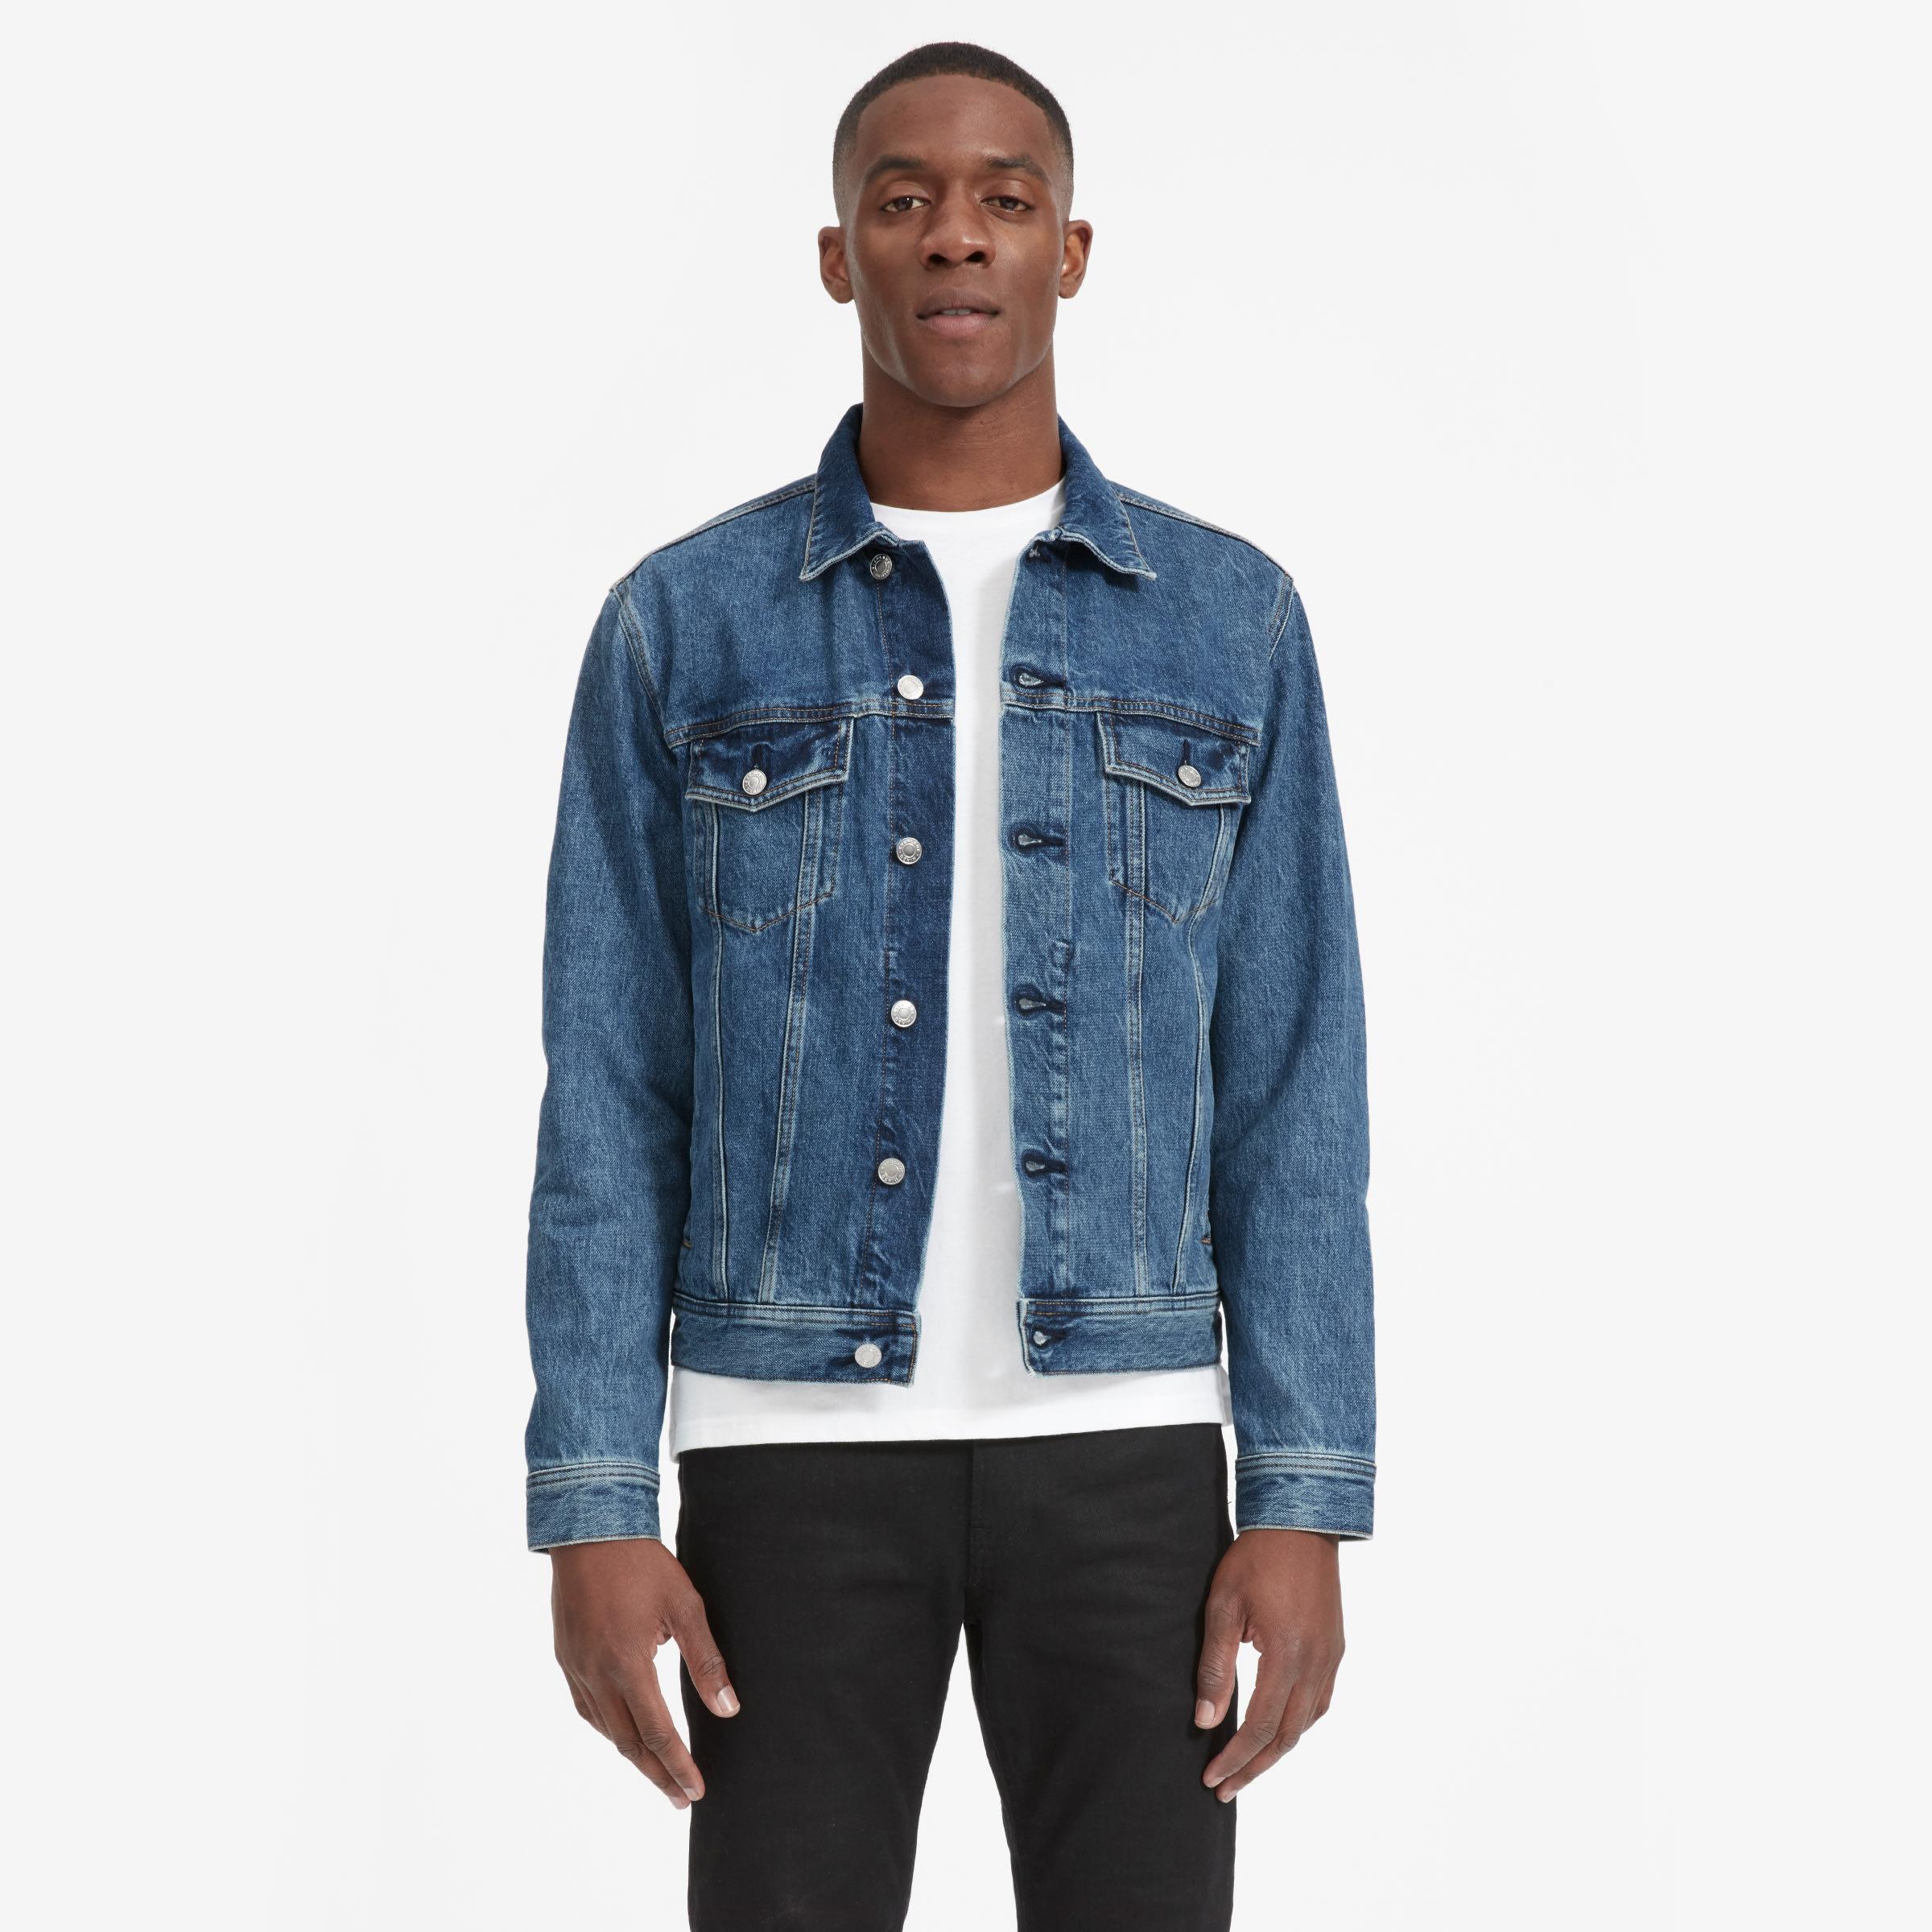 bb9e02826f3 Men's Denim Jacket | Everlane